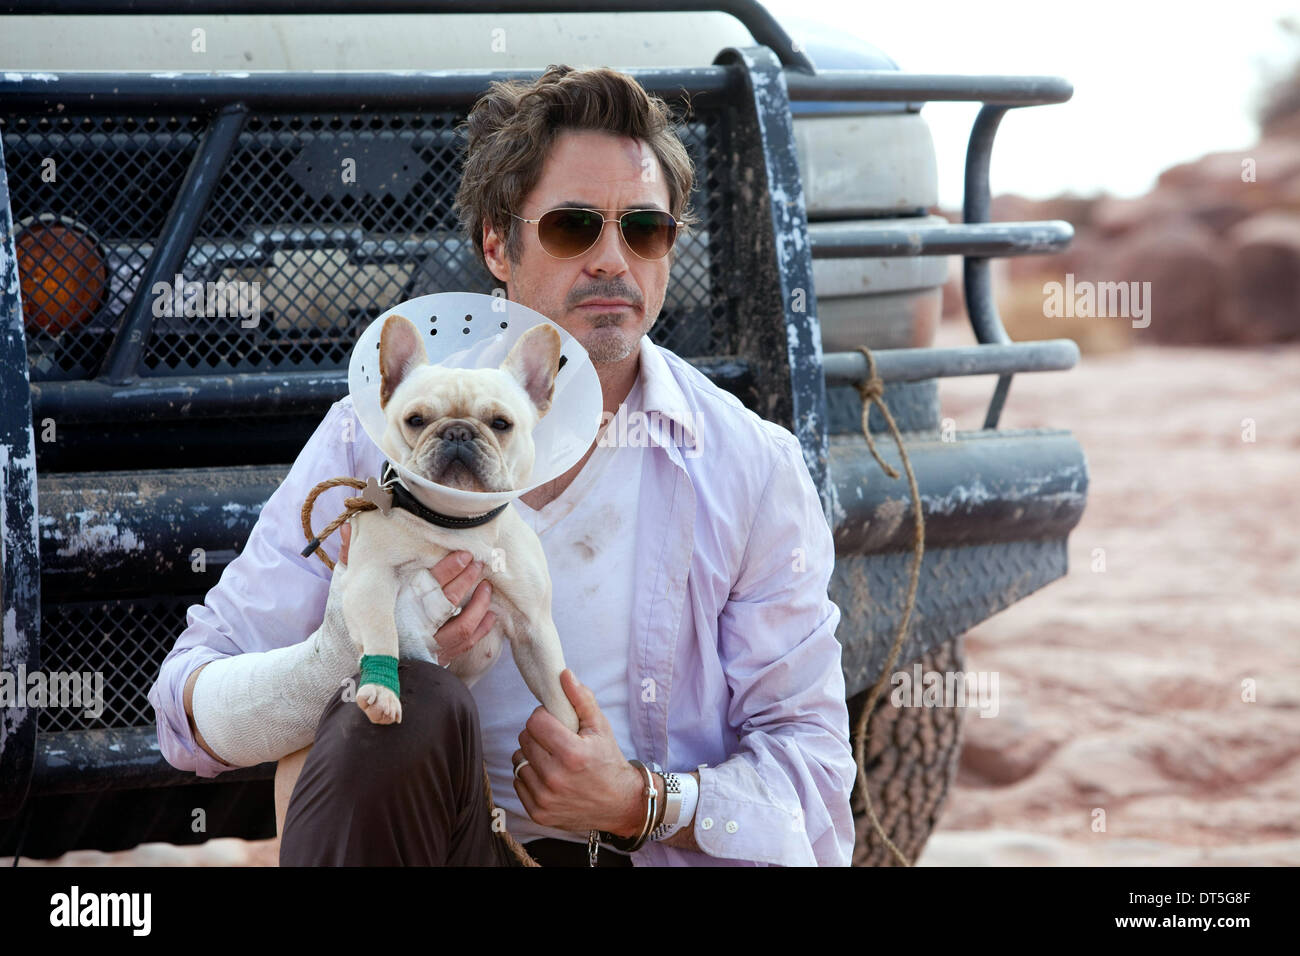 Robert Downey Jr Due Date 2010 Stock Photo Alamy